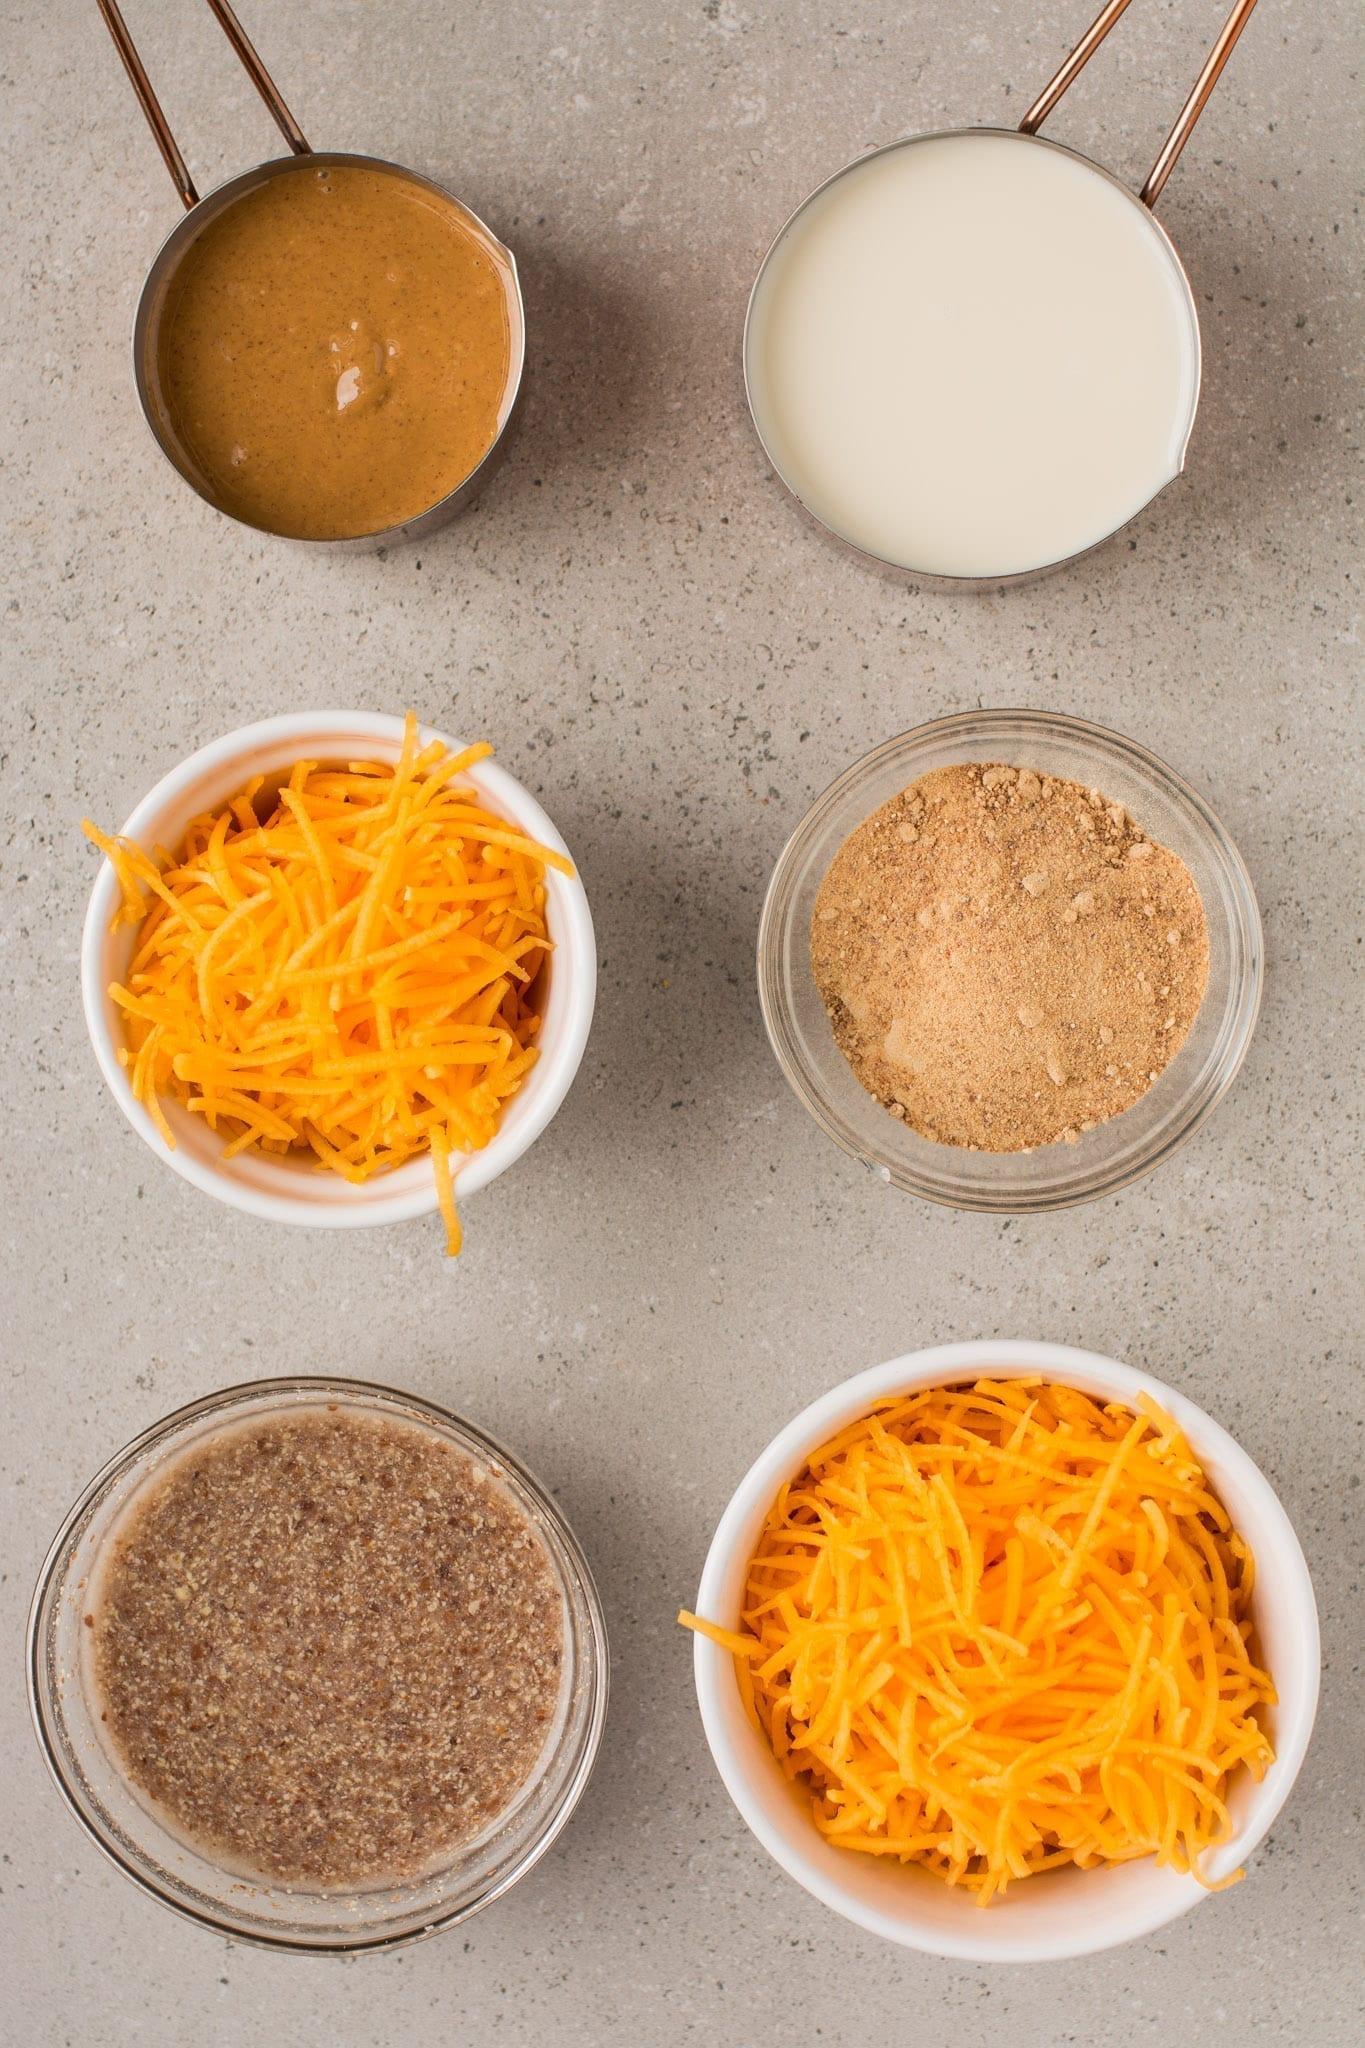 Wet ingredients of gluten free pumpkin bread